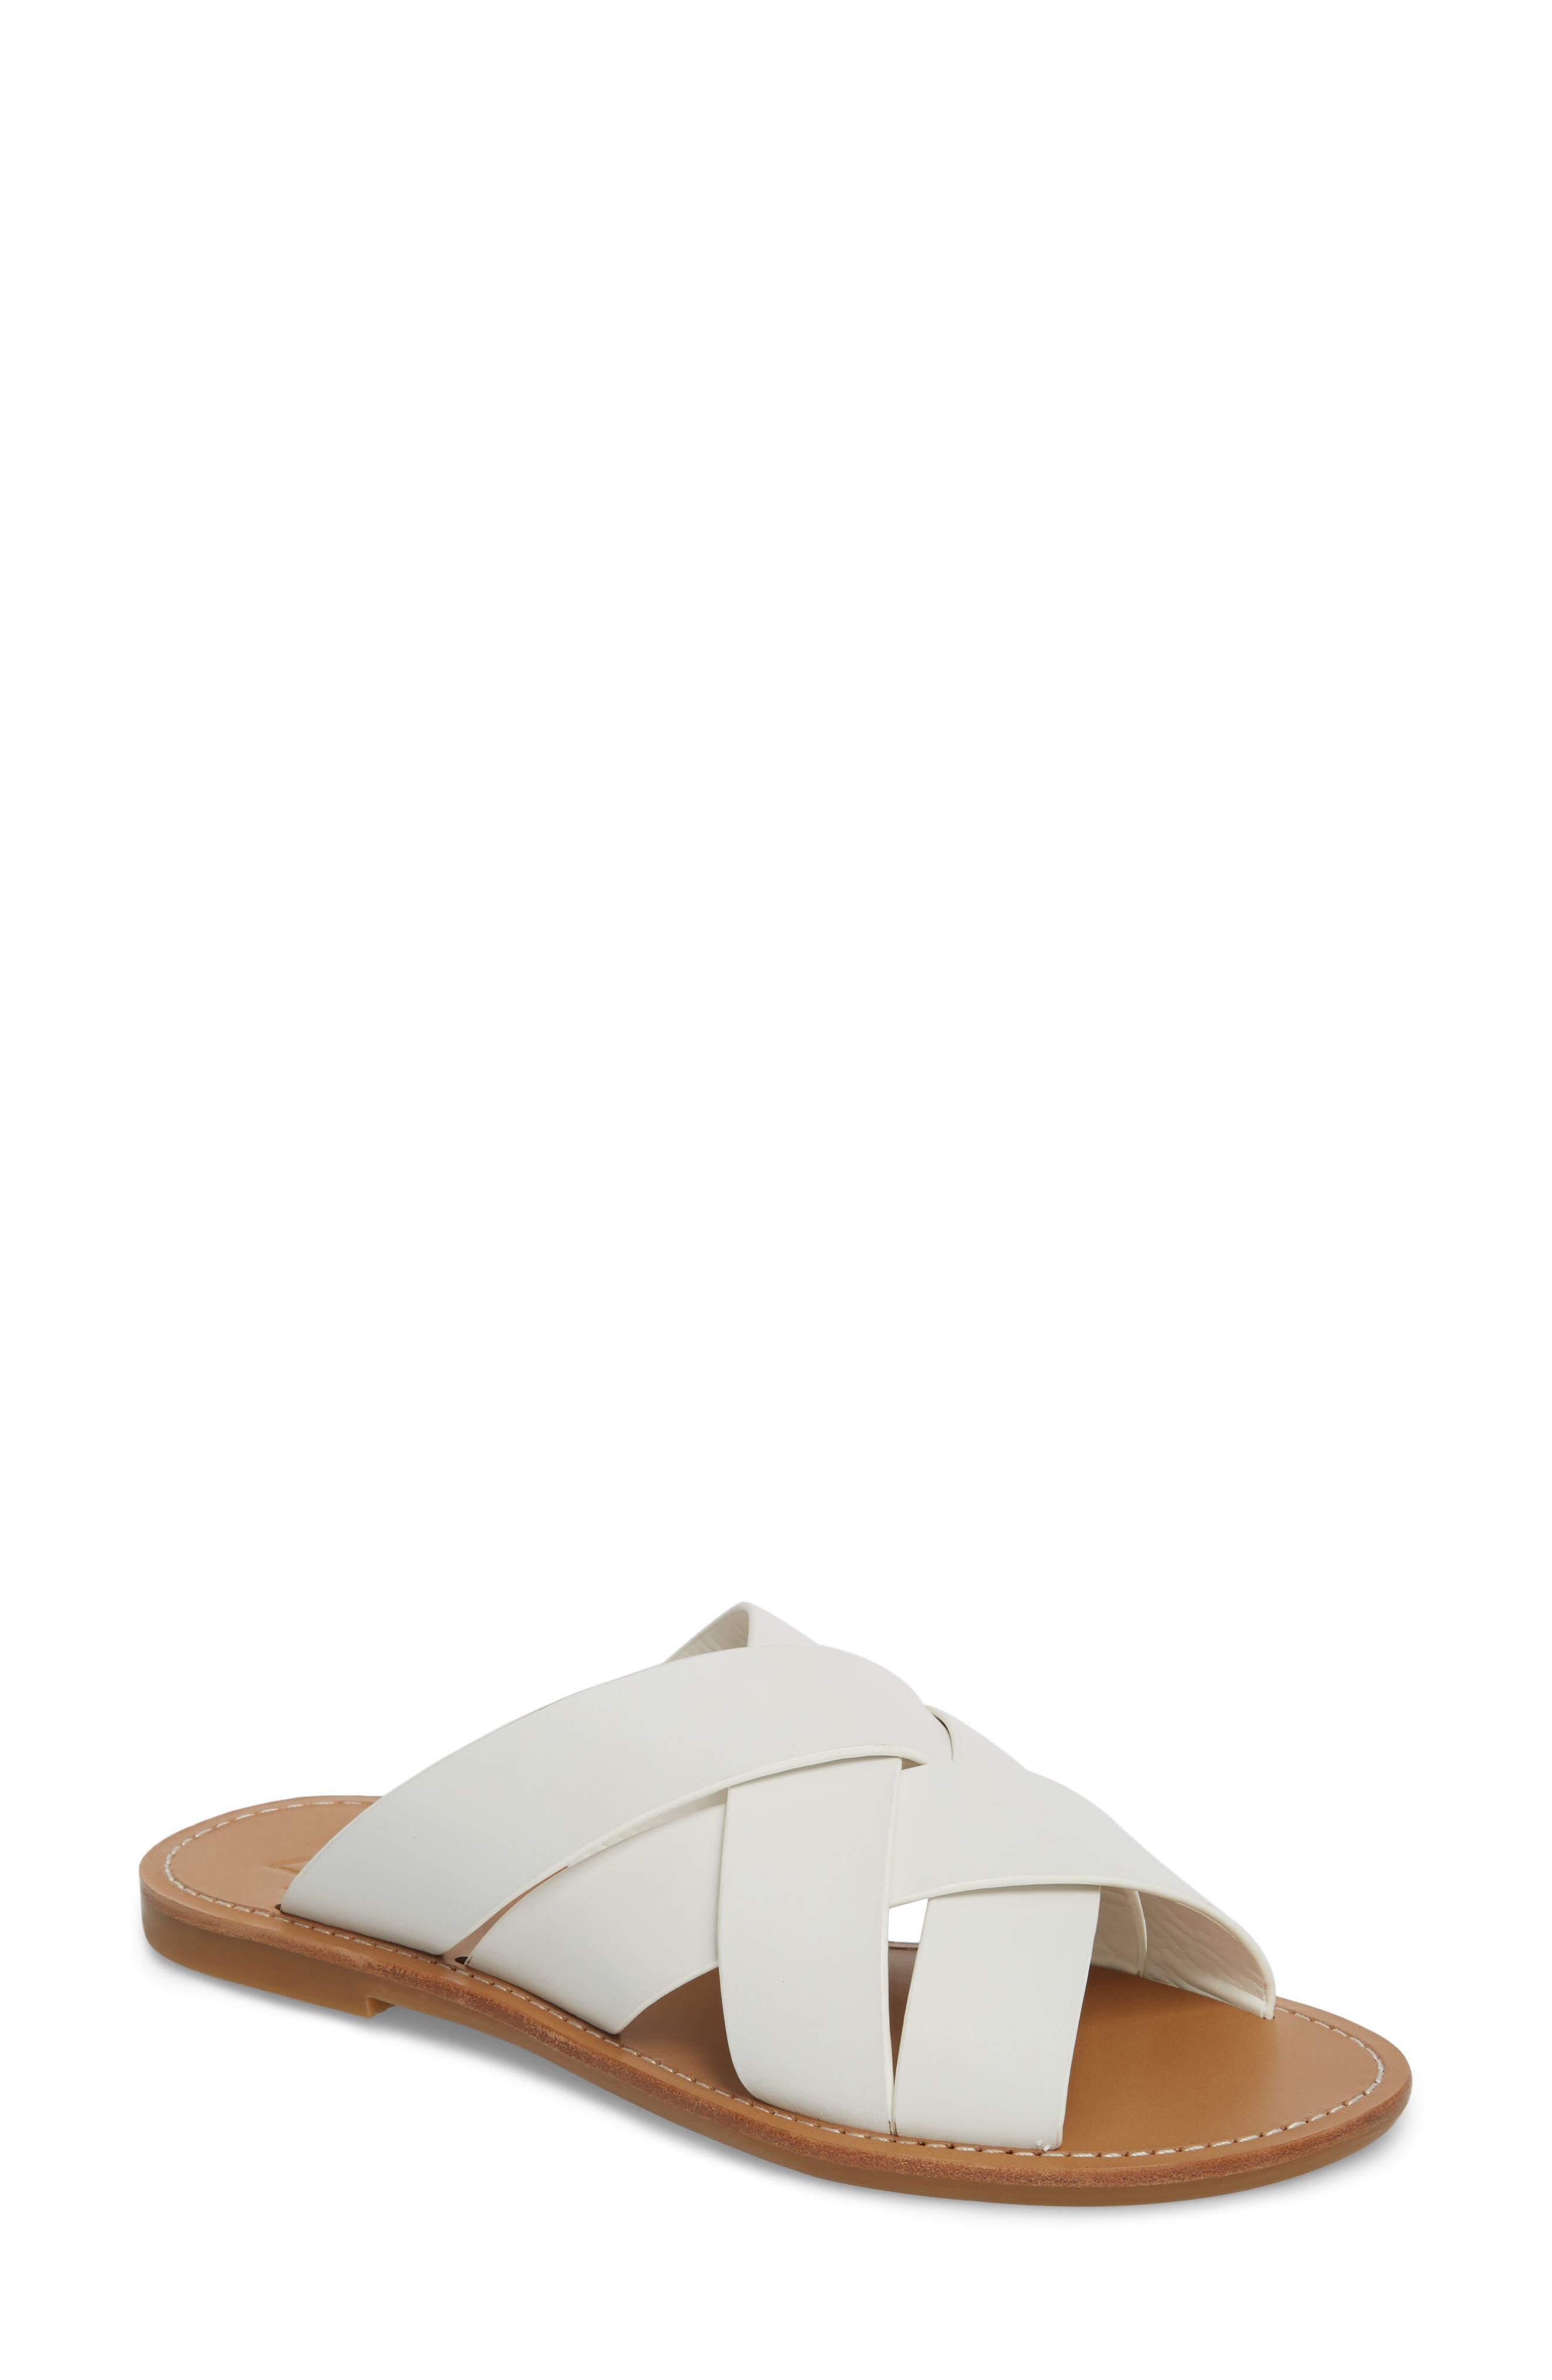 Raida Slide Sandal,                             Main thumbnail 1, color,                             White Leather